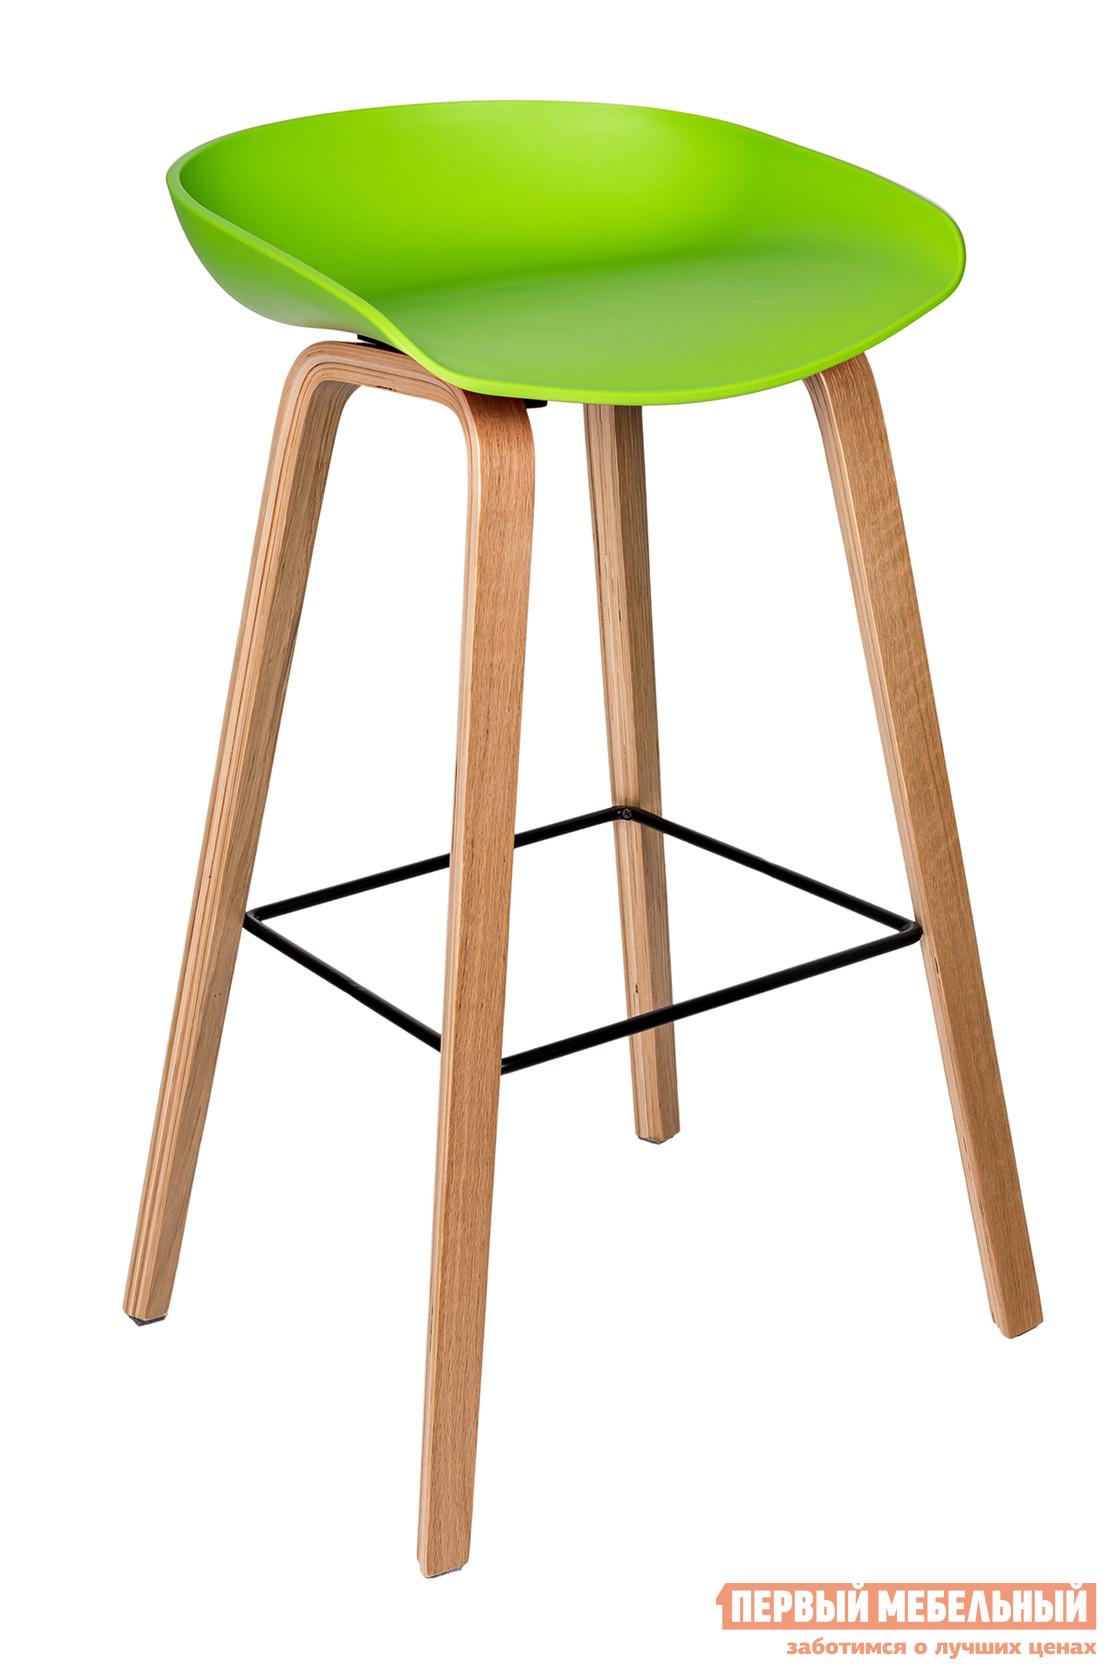 Барный стул STOOL GROUP Libra 8319 Зеленый от Купистол